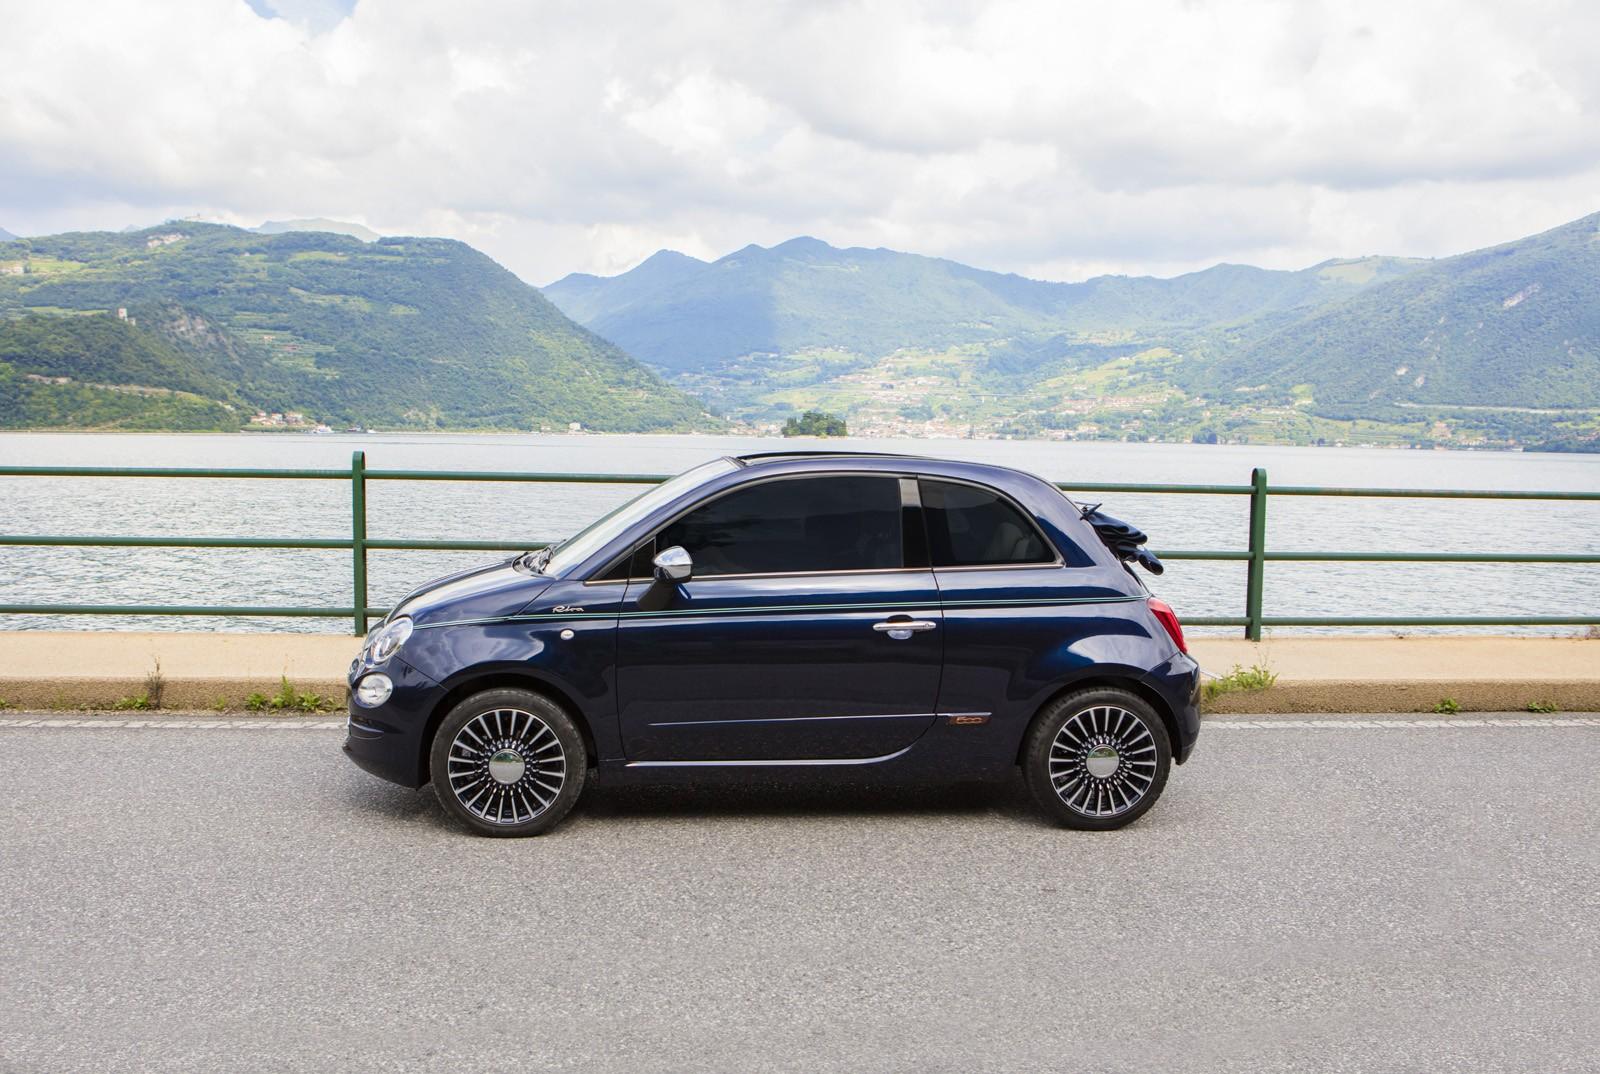 Fiat 500 Riva Edition Is Ready To Set Sail Autoevolution